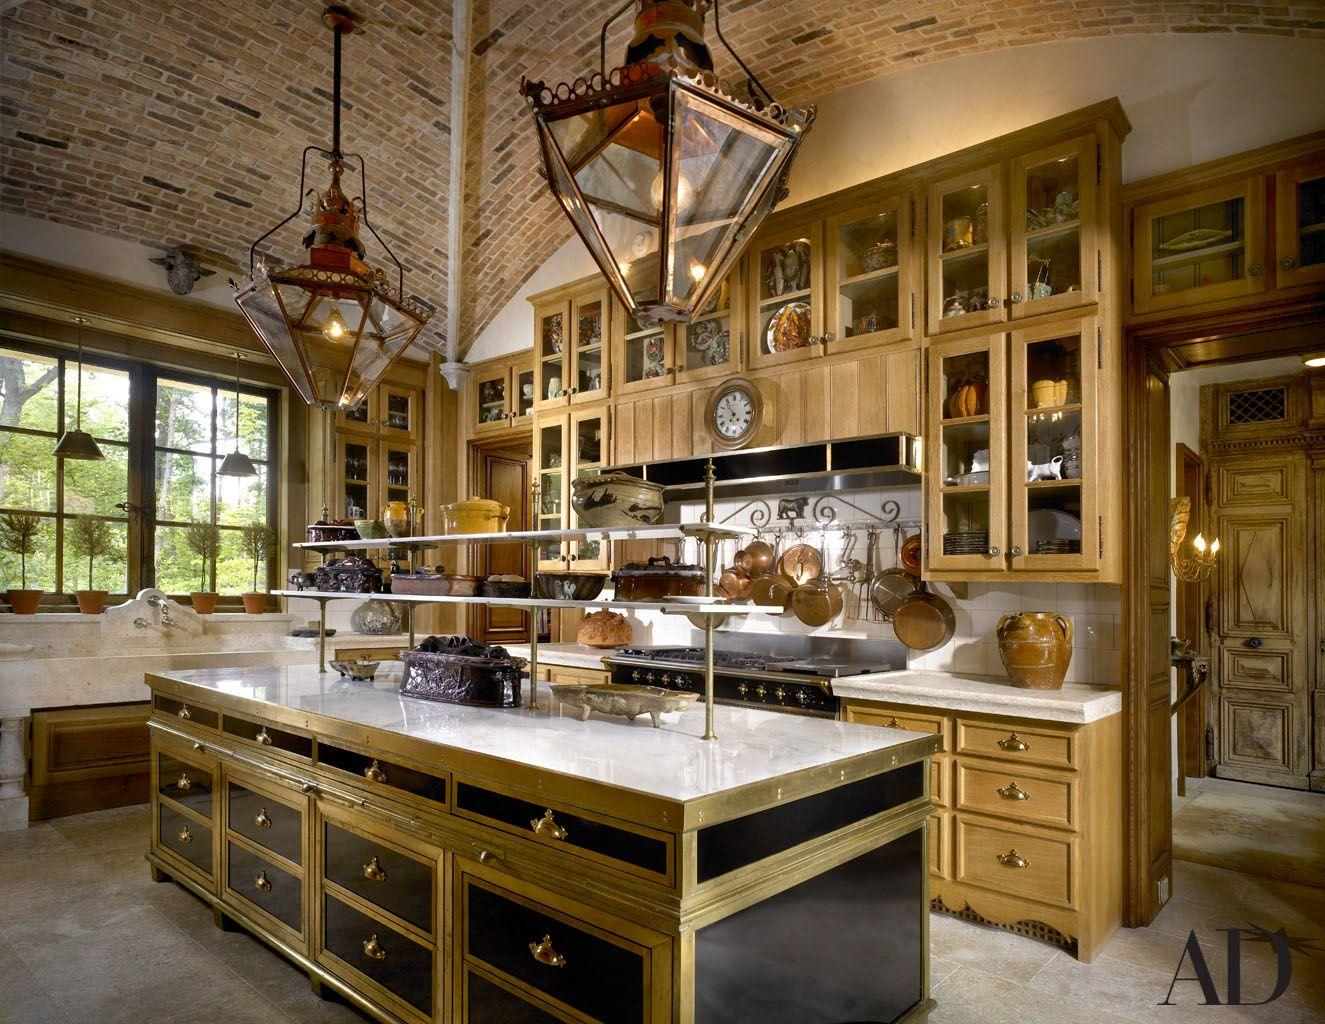 european kitchen inside robin buxbaum's lake forest, il